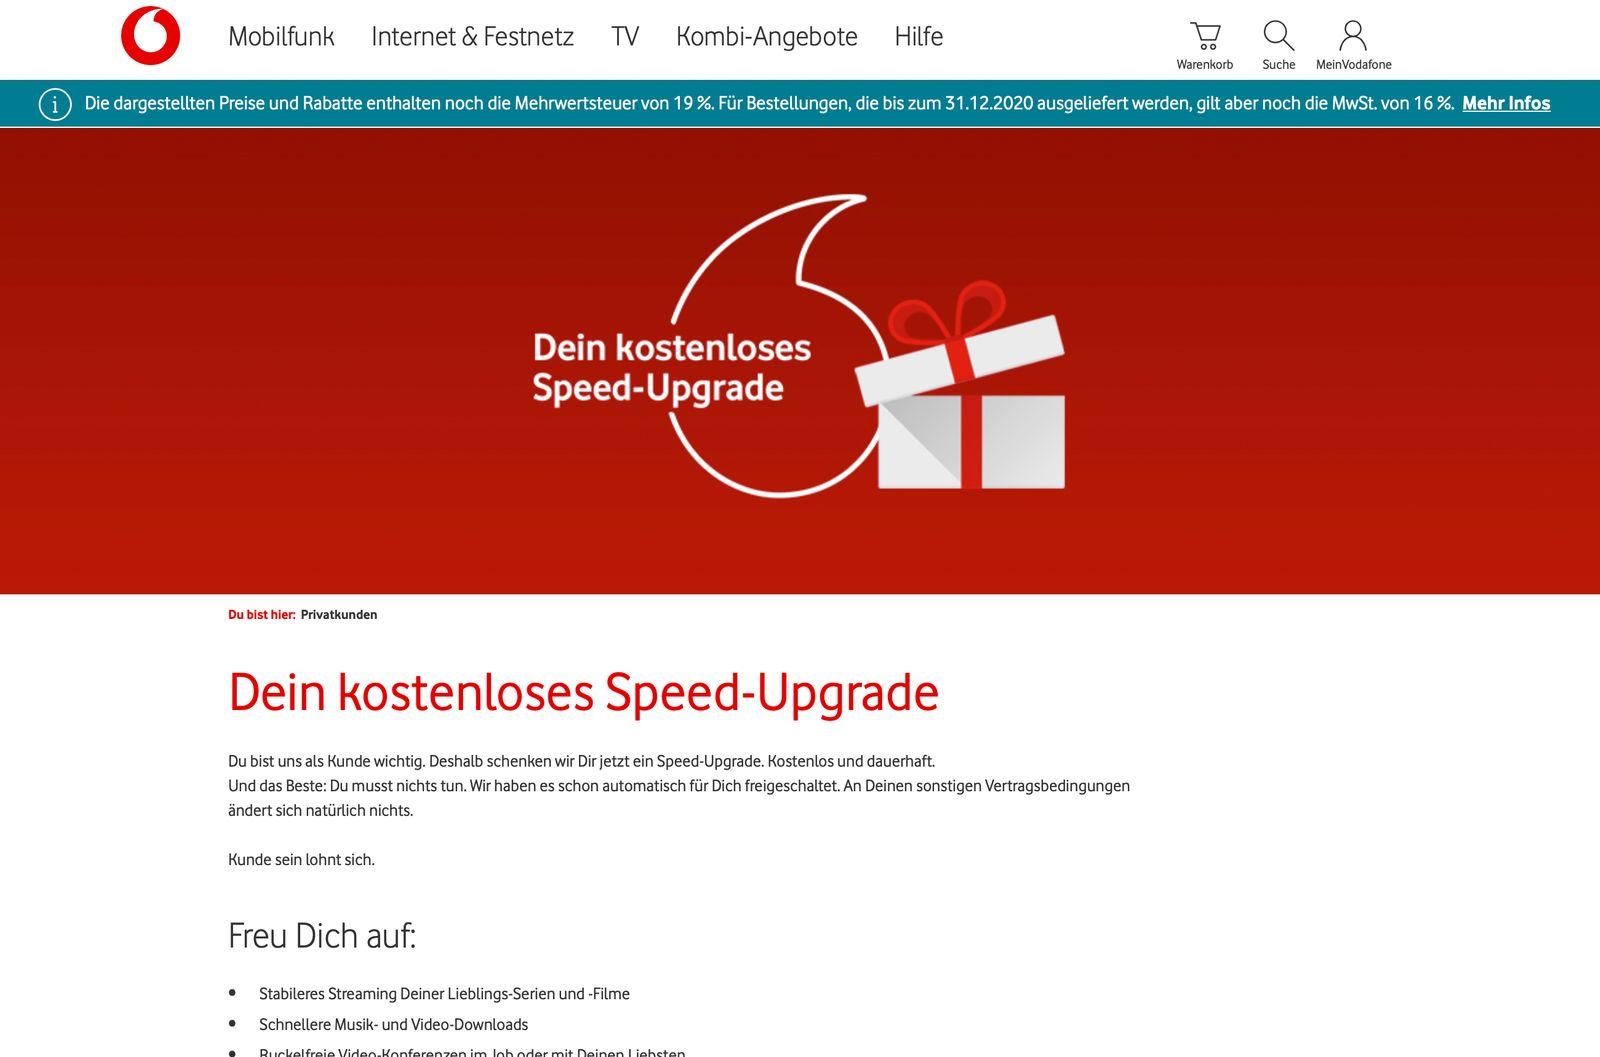 vodafone.de/privat/speed.html